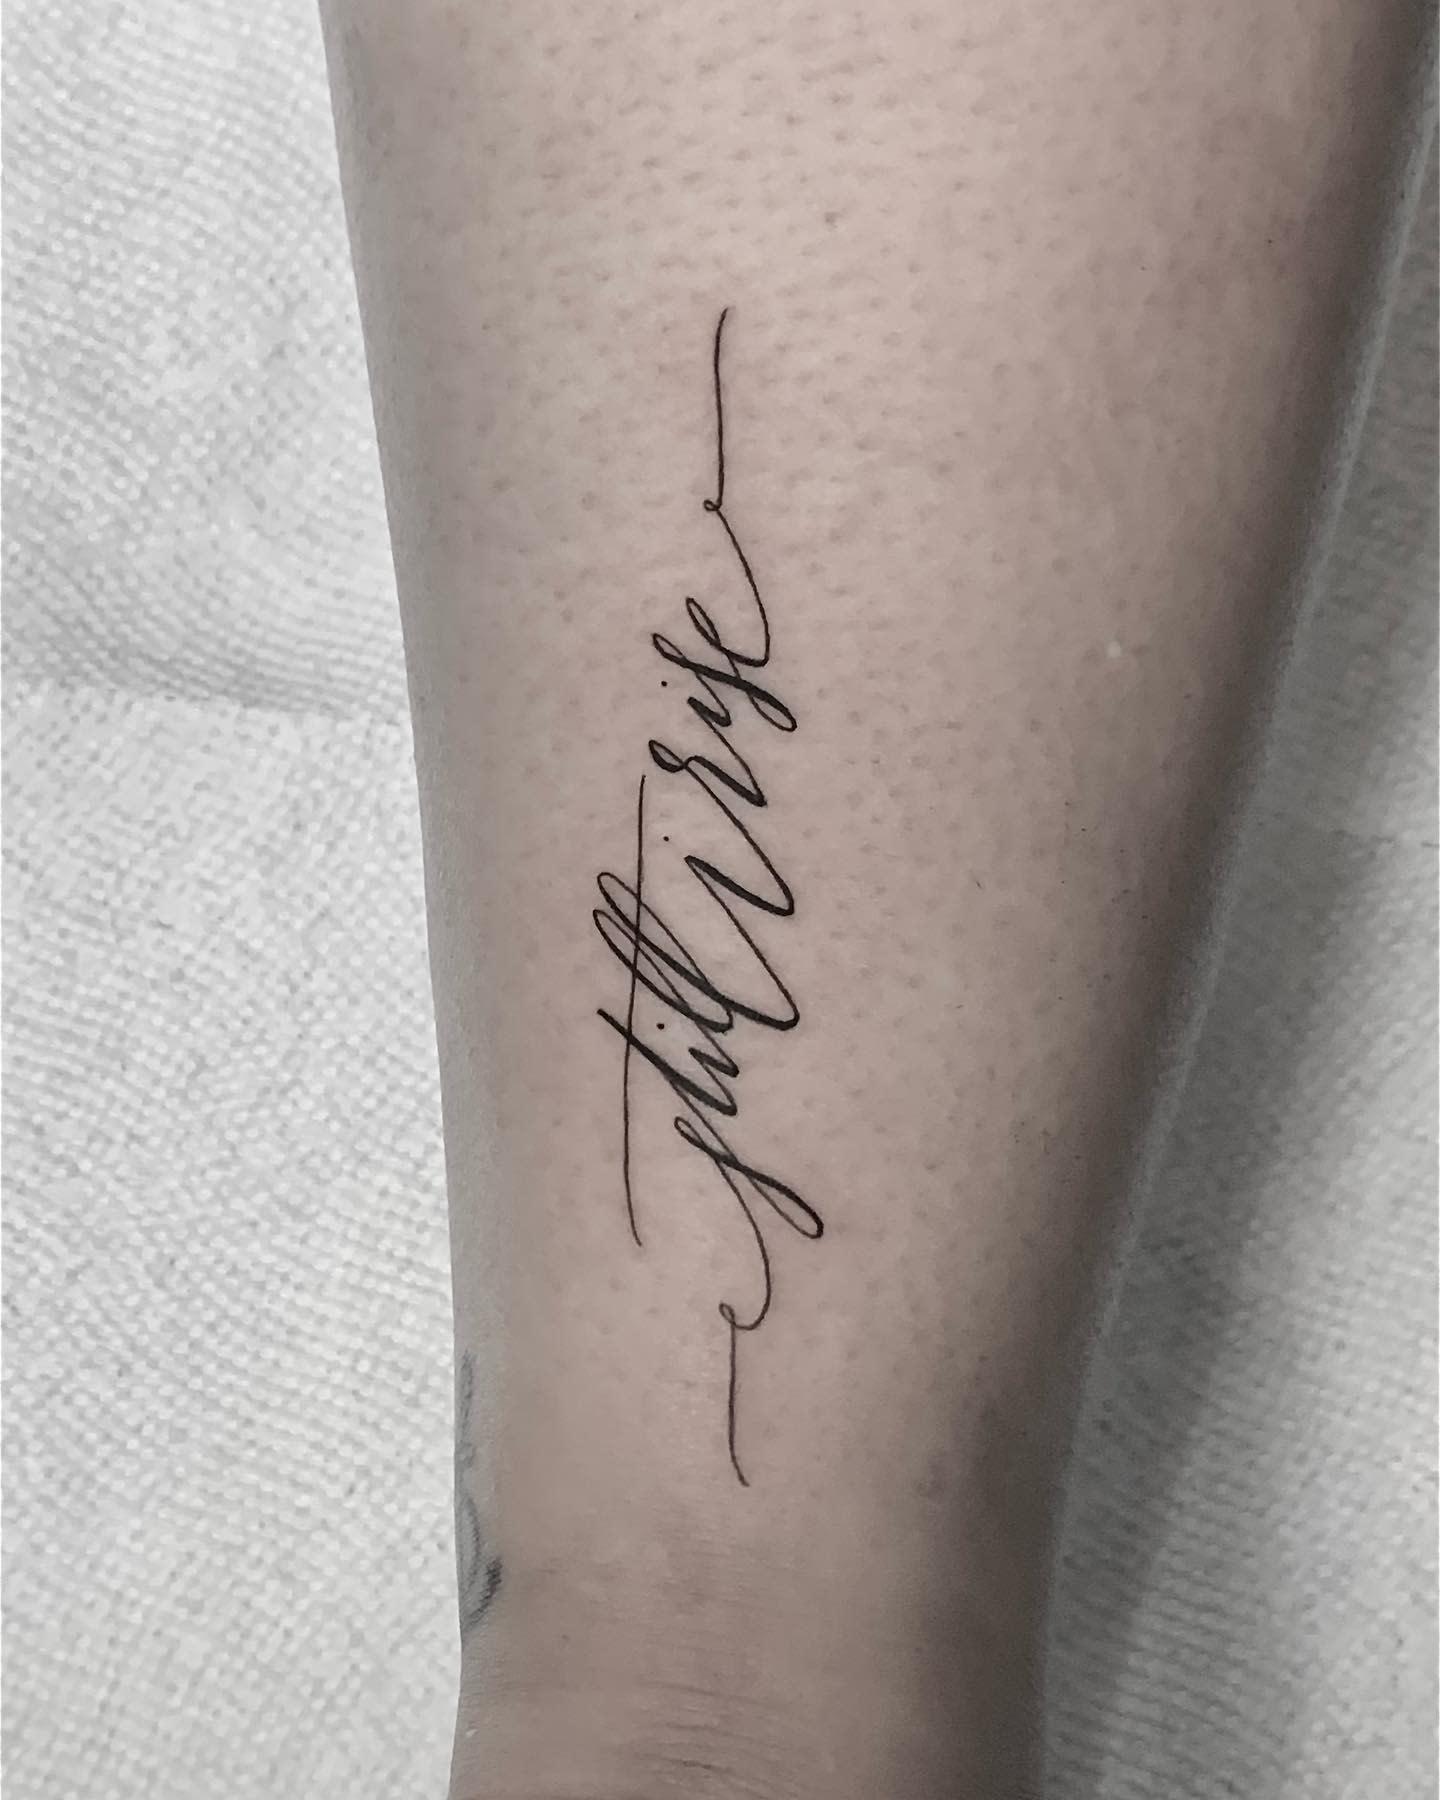 Cursive Still I Rise Tattoo -hollywoodstarstattoo